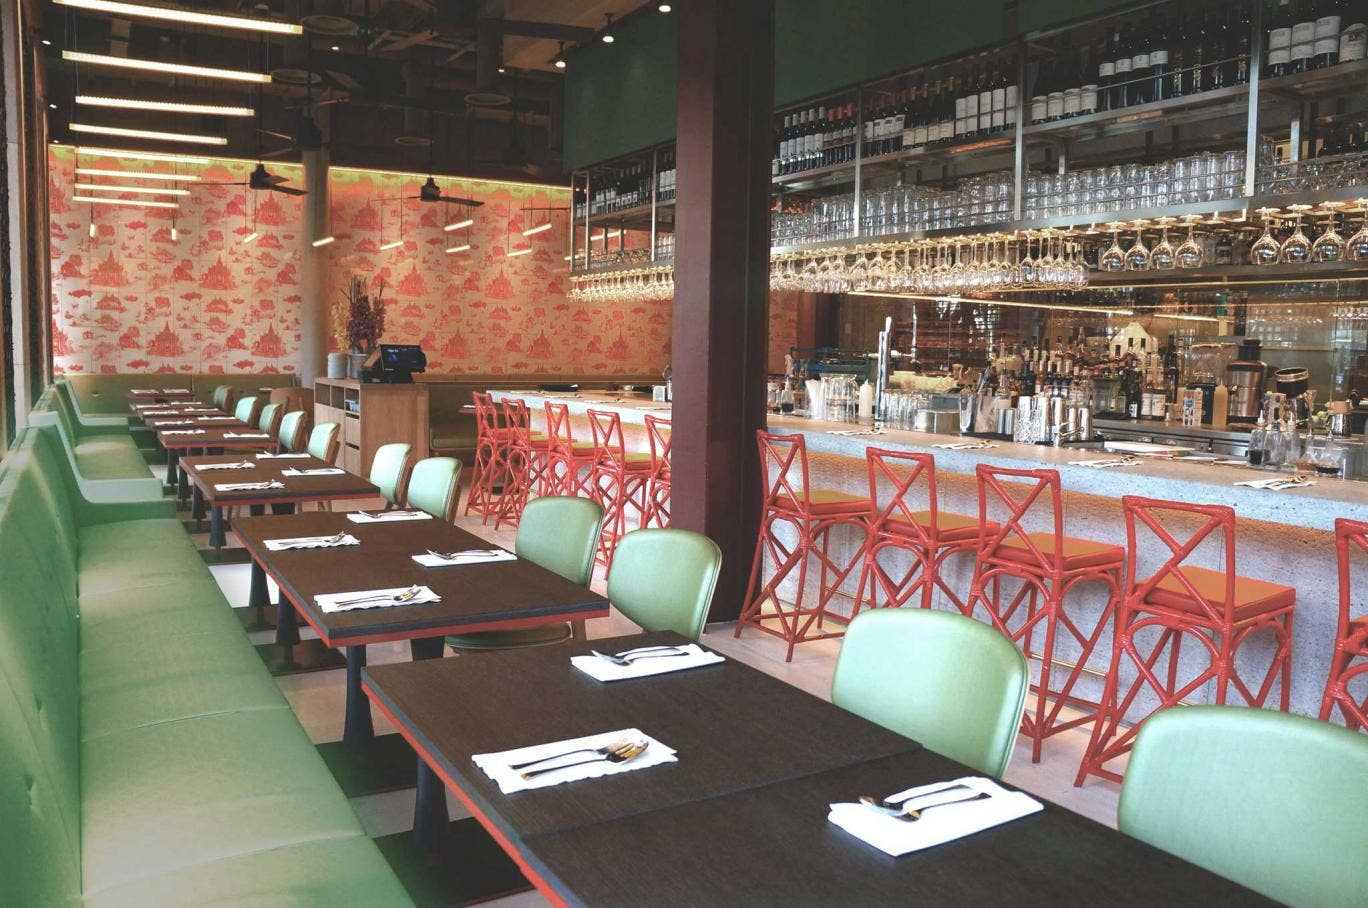 Naamyaa Café is a beautifully designed restaurant